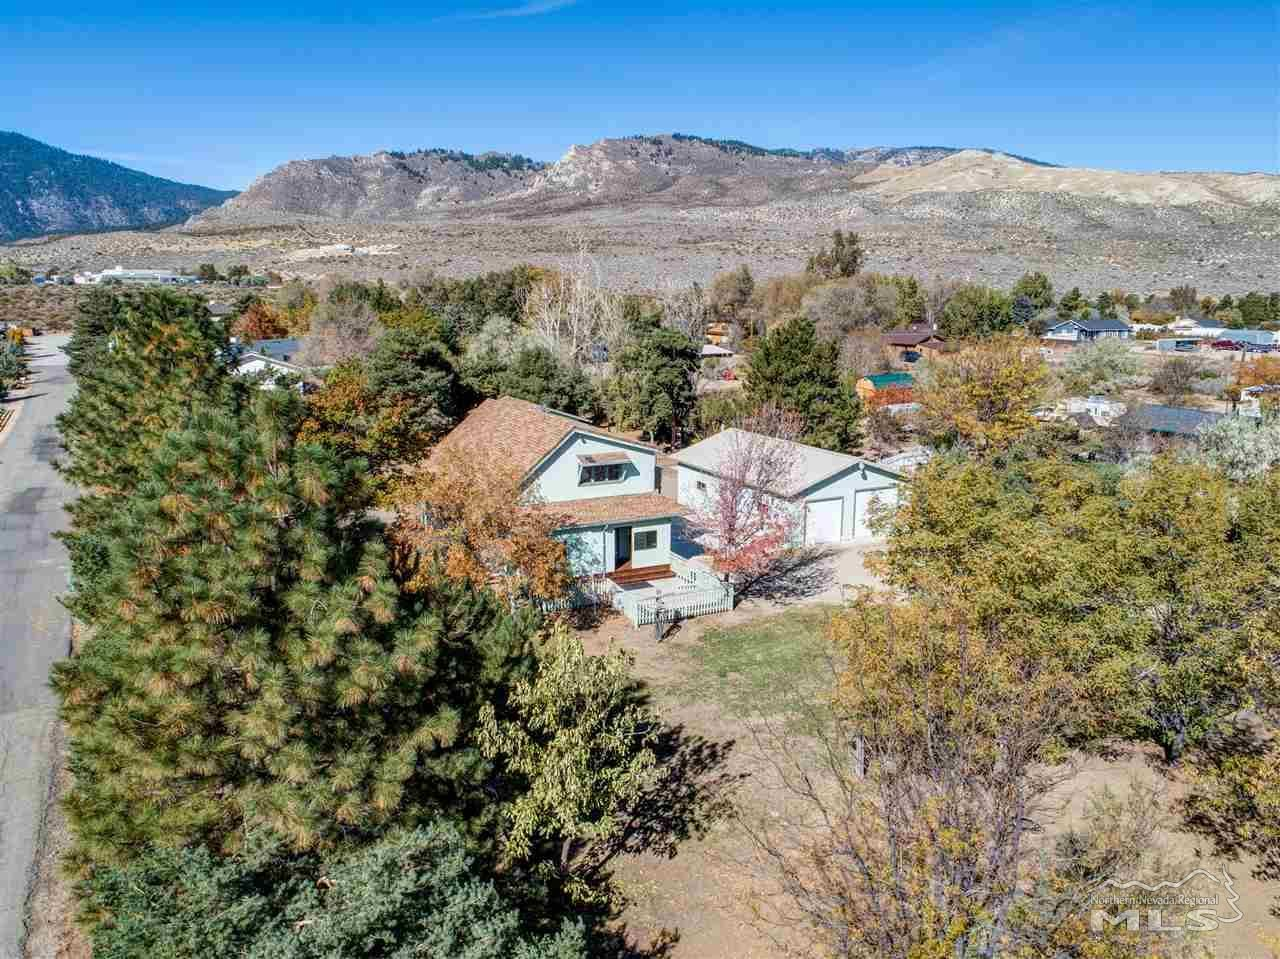 Photo of 780 Pawnee St., Carson City, NV 89705-6938 (MLS # 190017172)